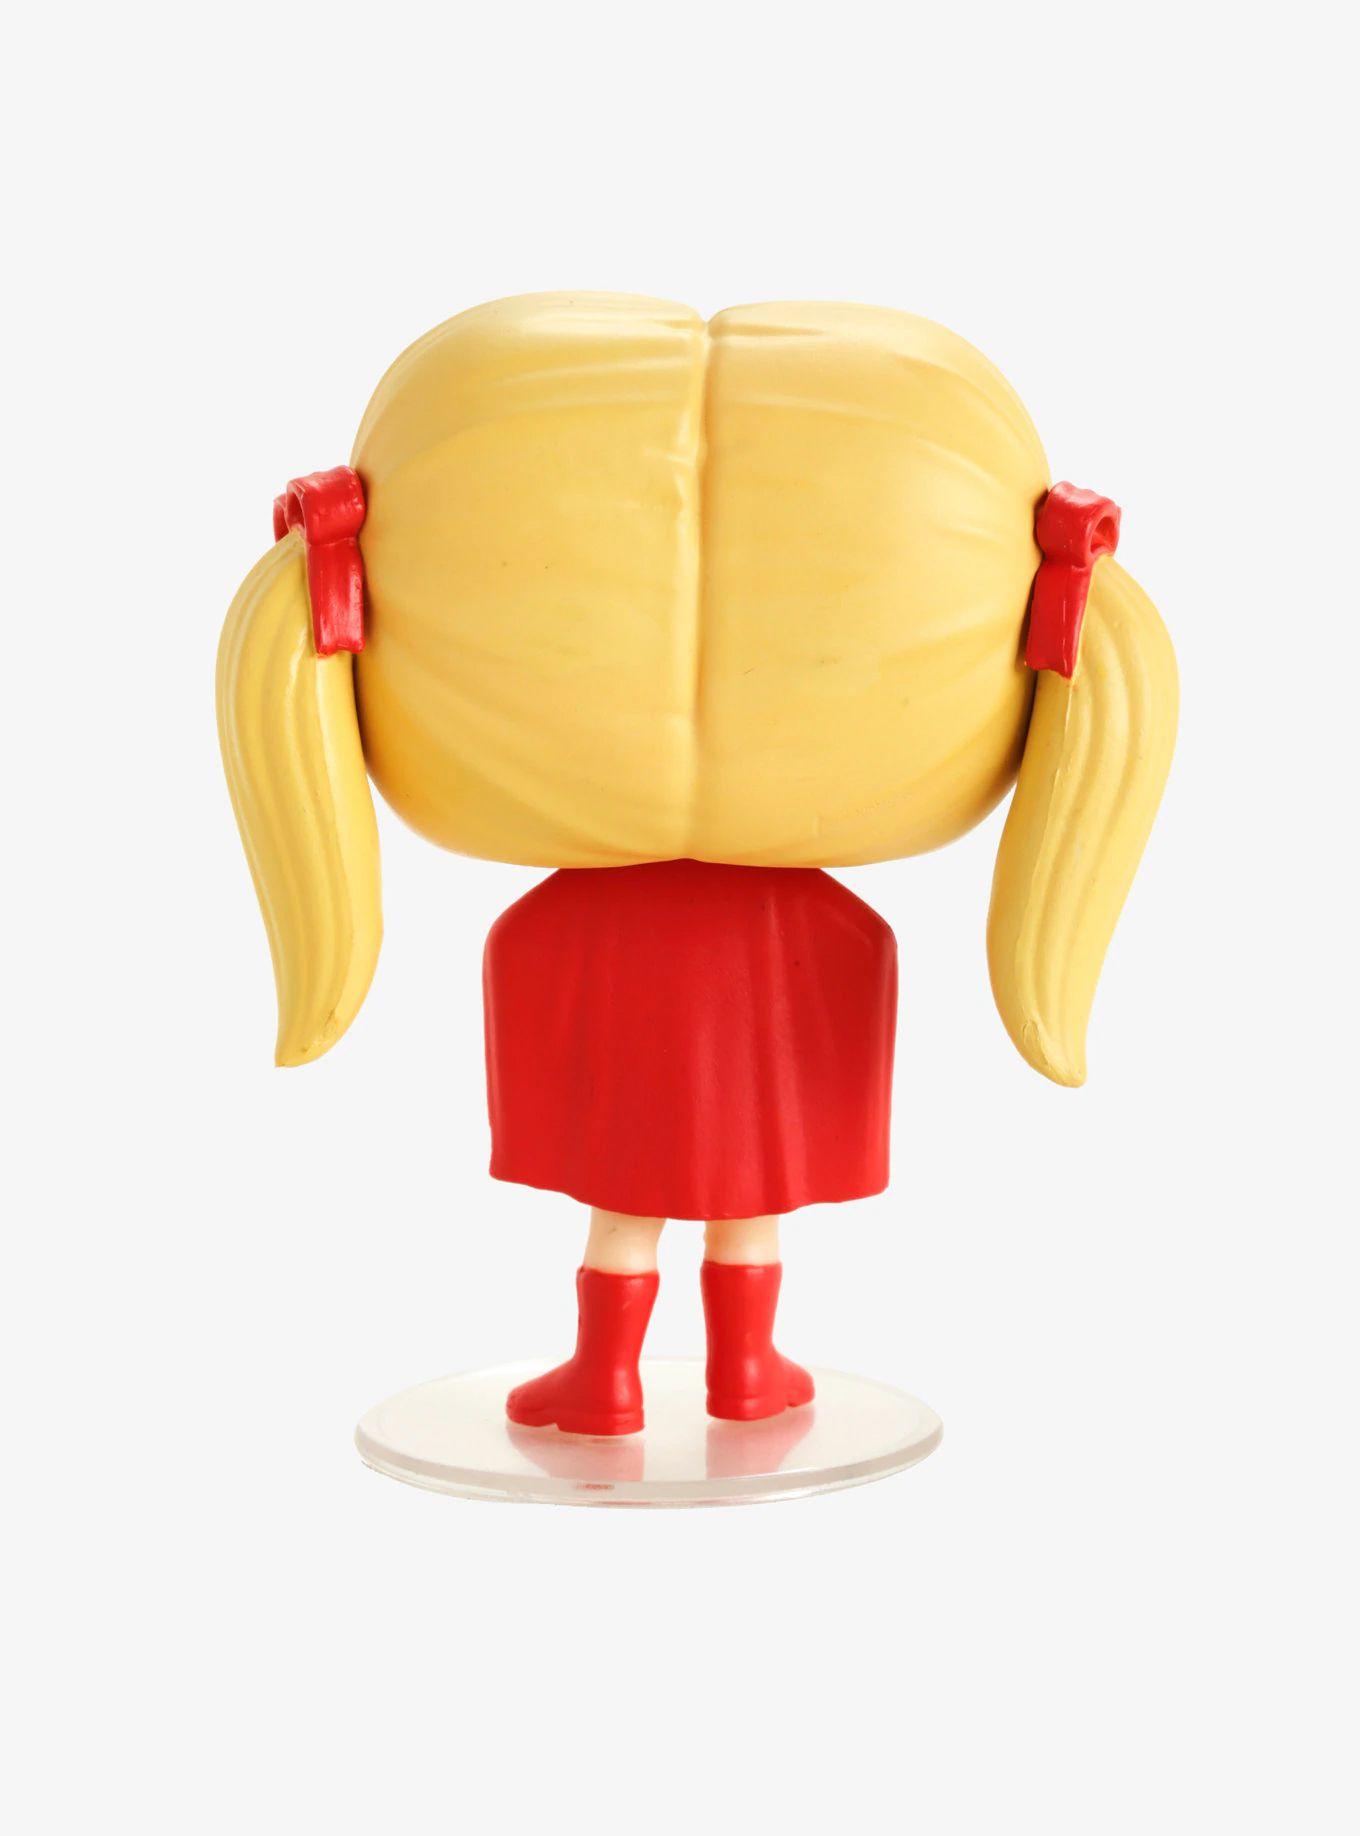 Phoebe Buffay #705 - Friends - Funko Pop! Television